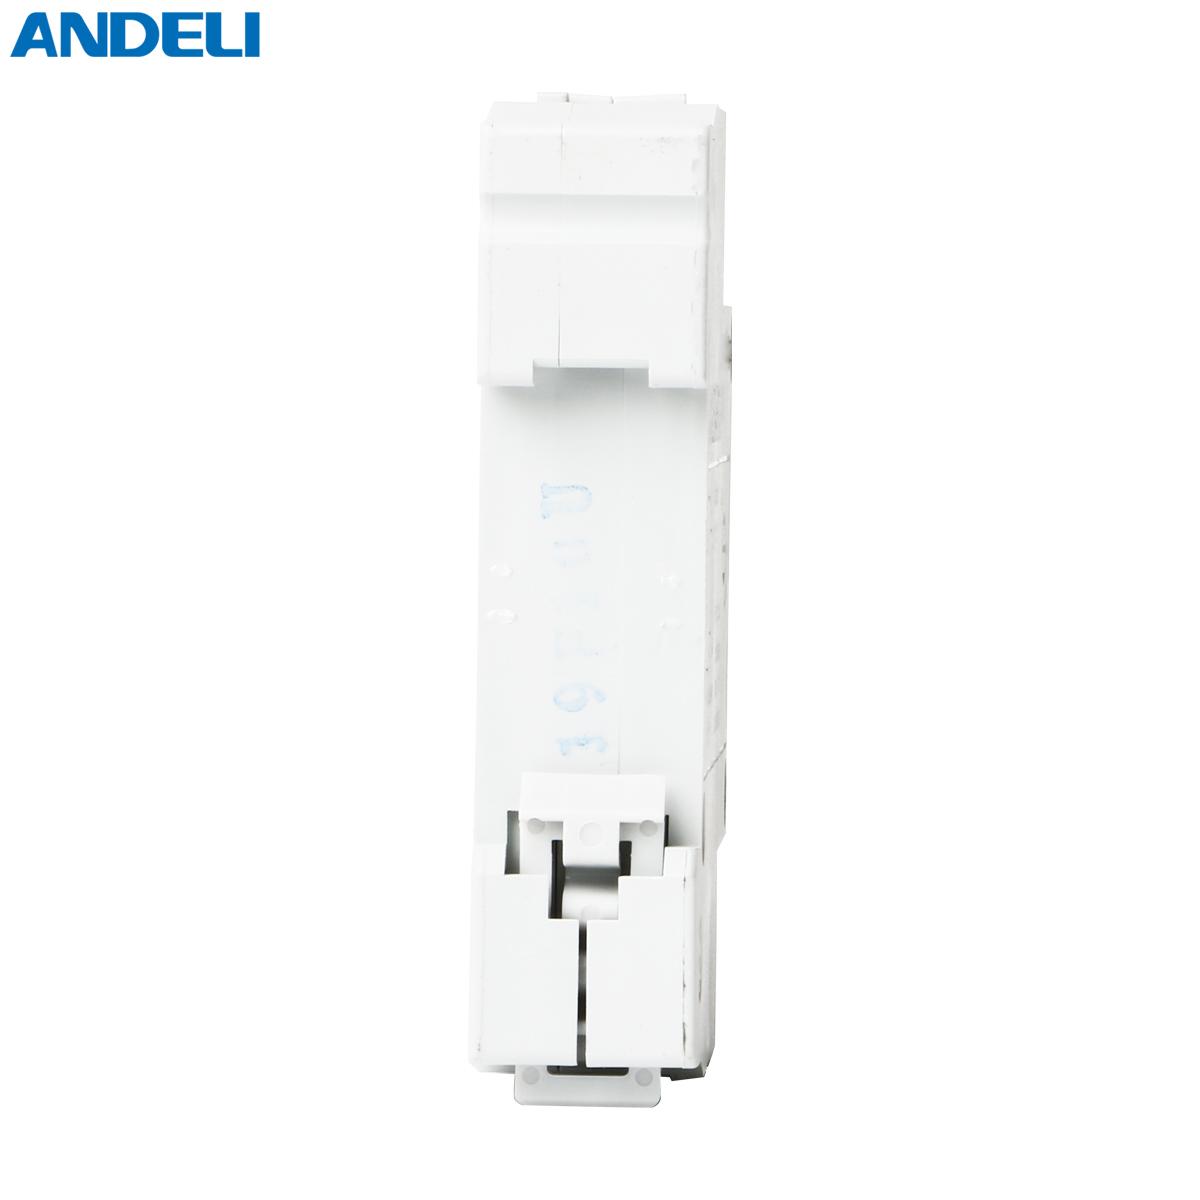 circuit breaker press DZ47-63 andeli 1P miniature mcb